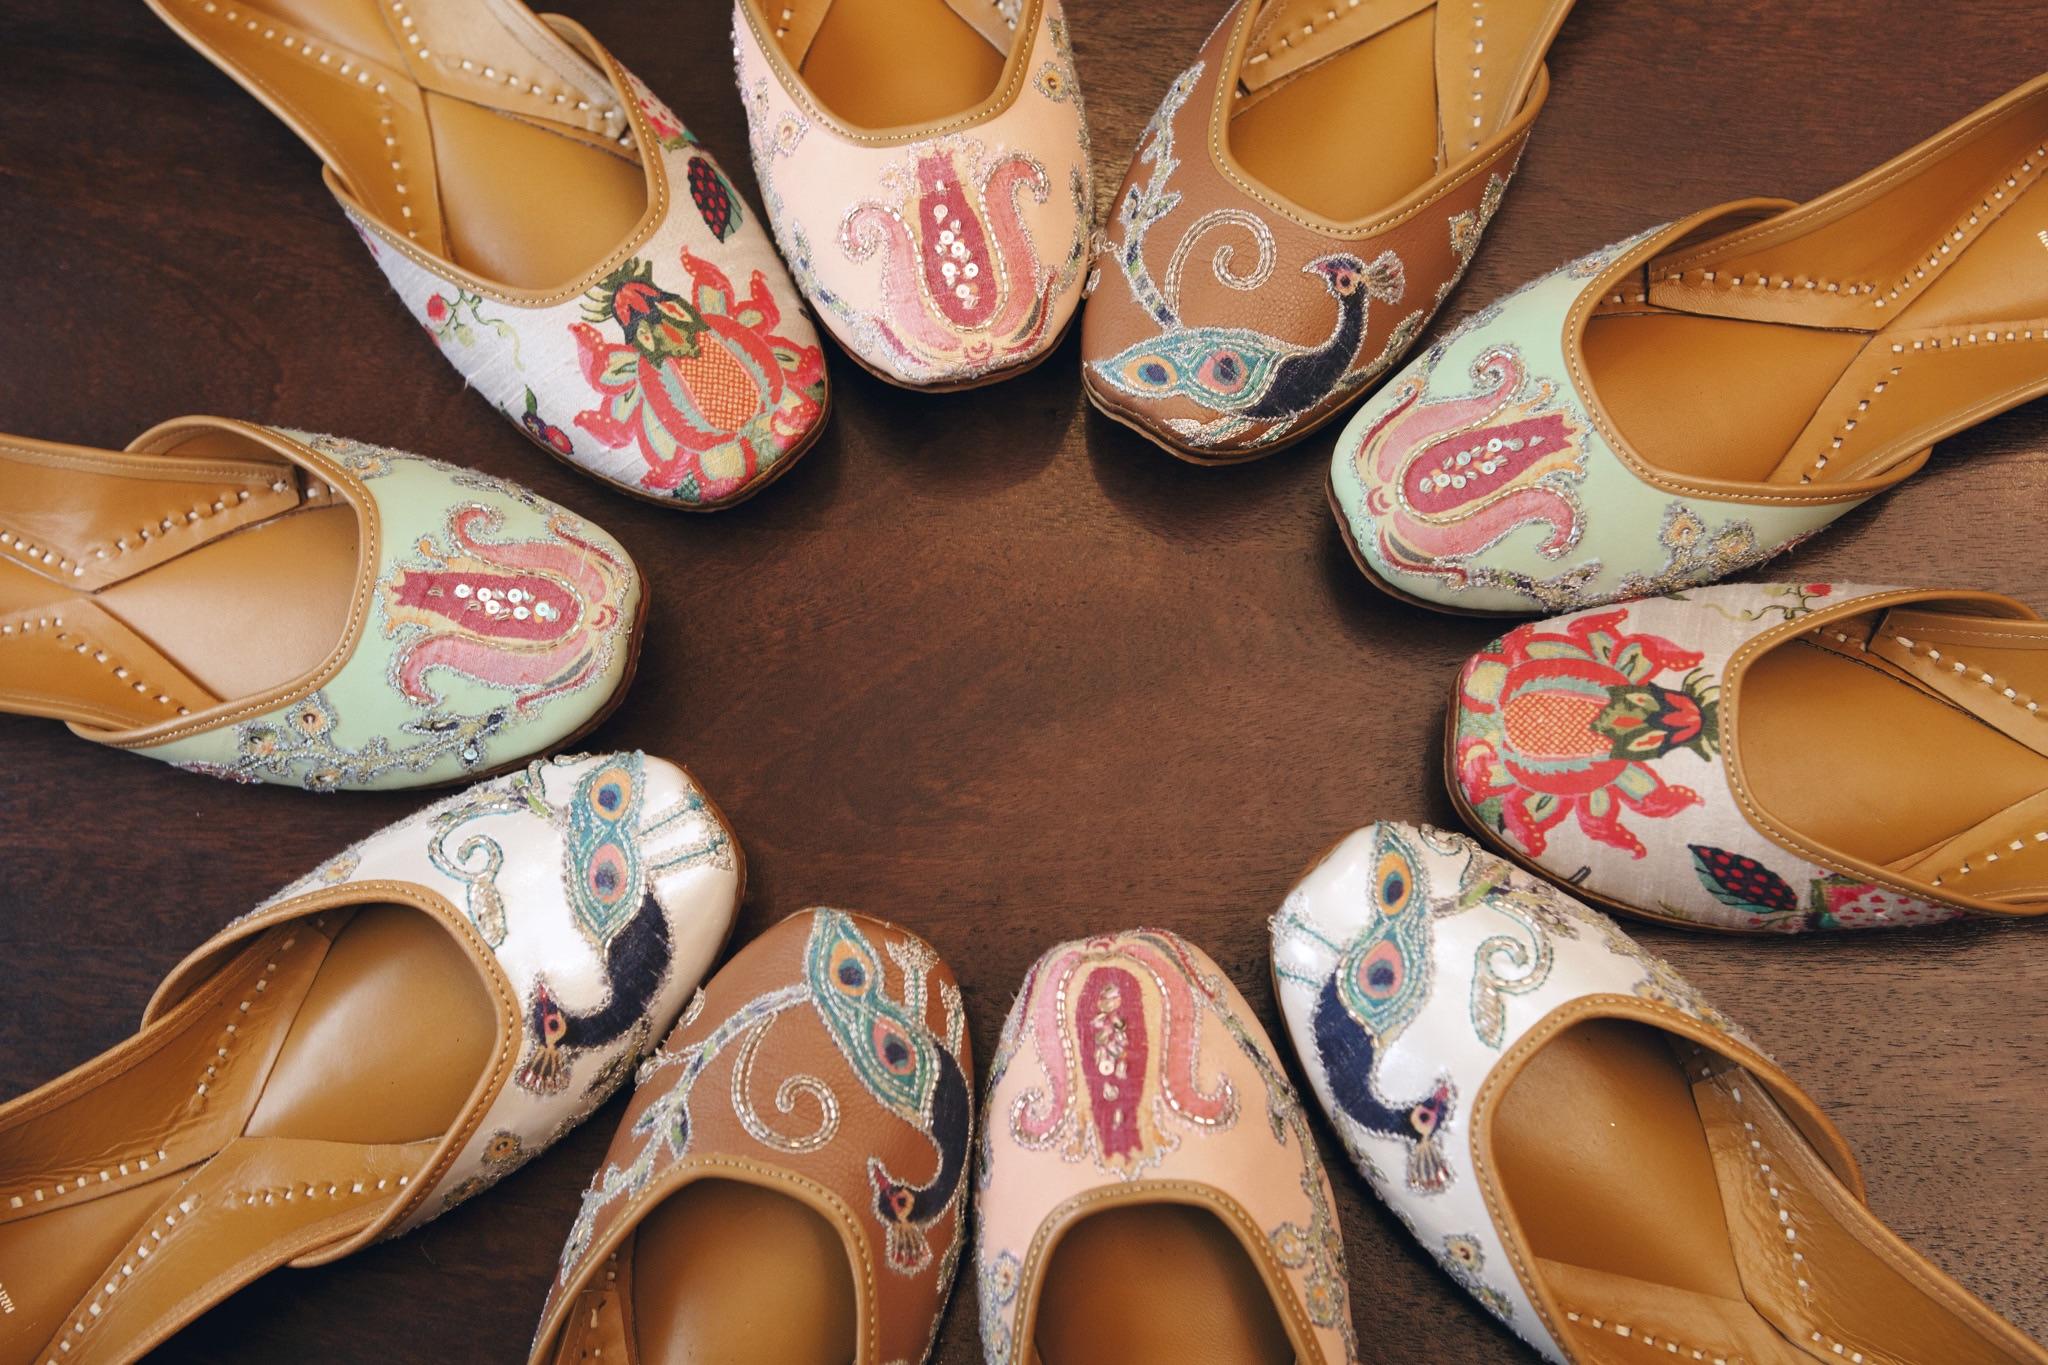 Mendhi footwear for guests in India